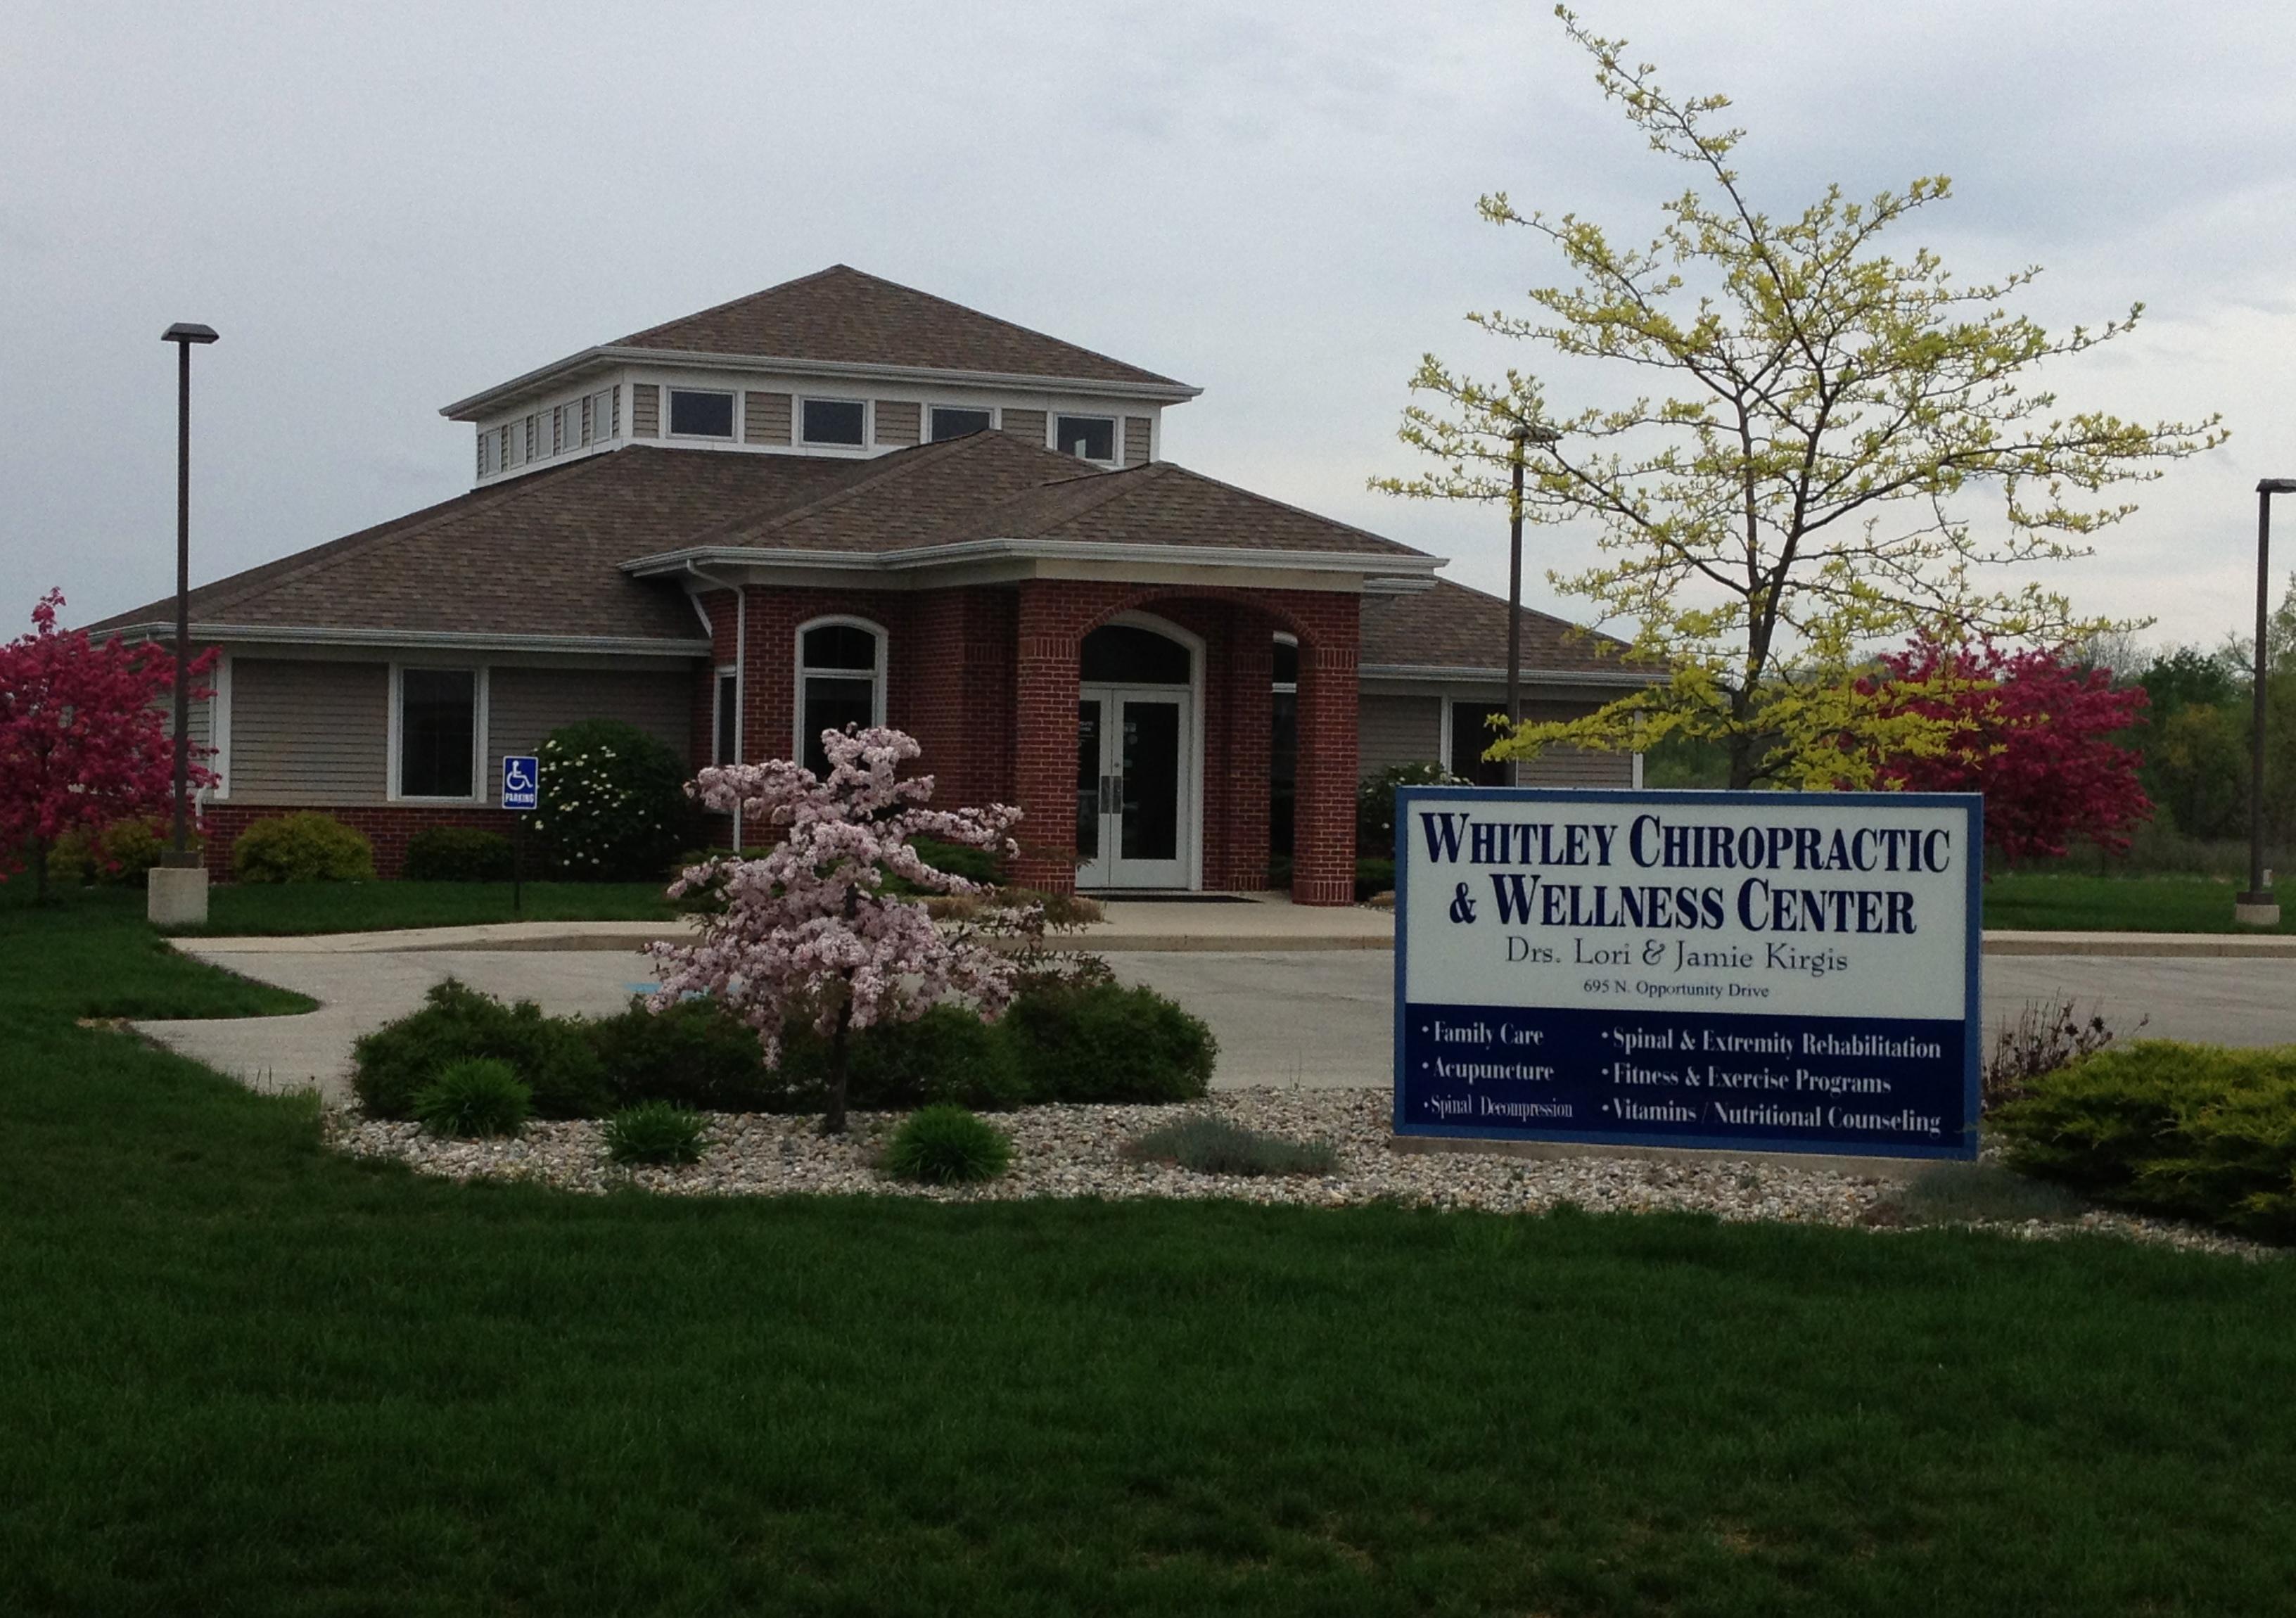 Whitley Chiropractic Wellness Center in Columbia CityIN